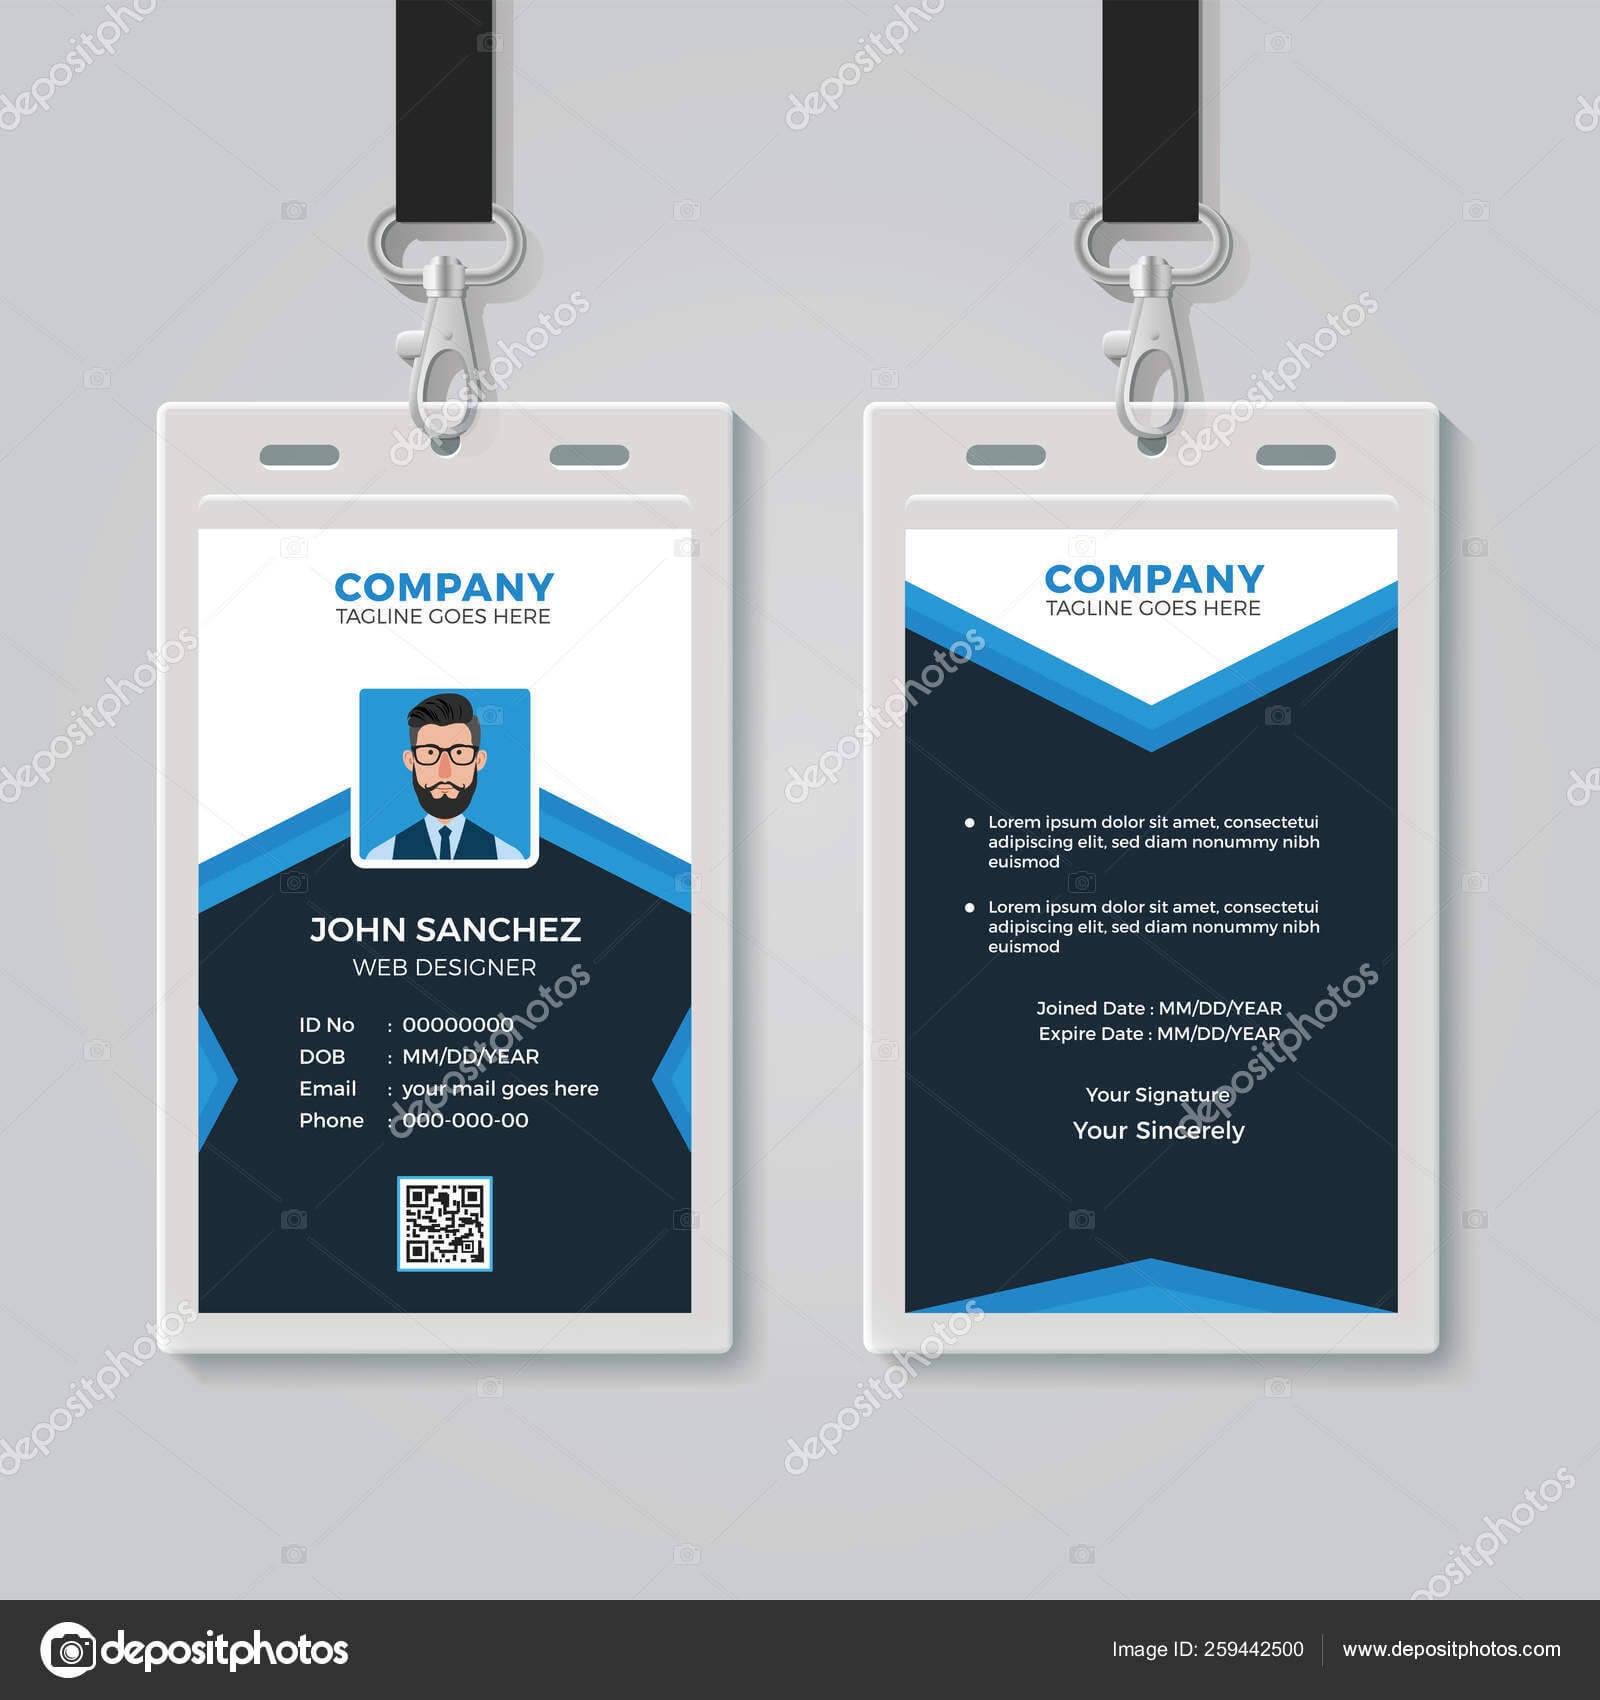 Id Card Design Template — Stock Vector © Bonezboyz #259442500 Throughout Photographer Id Card Template